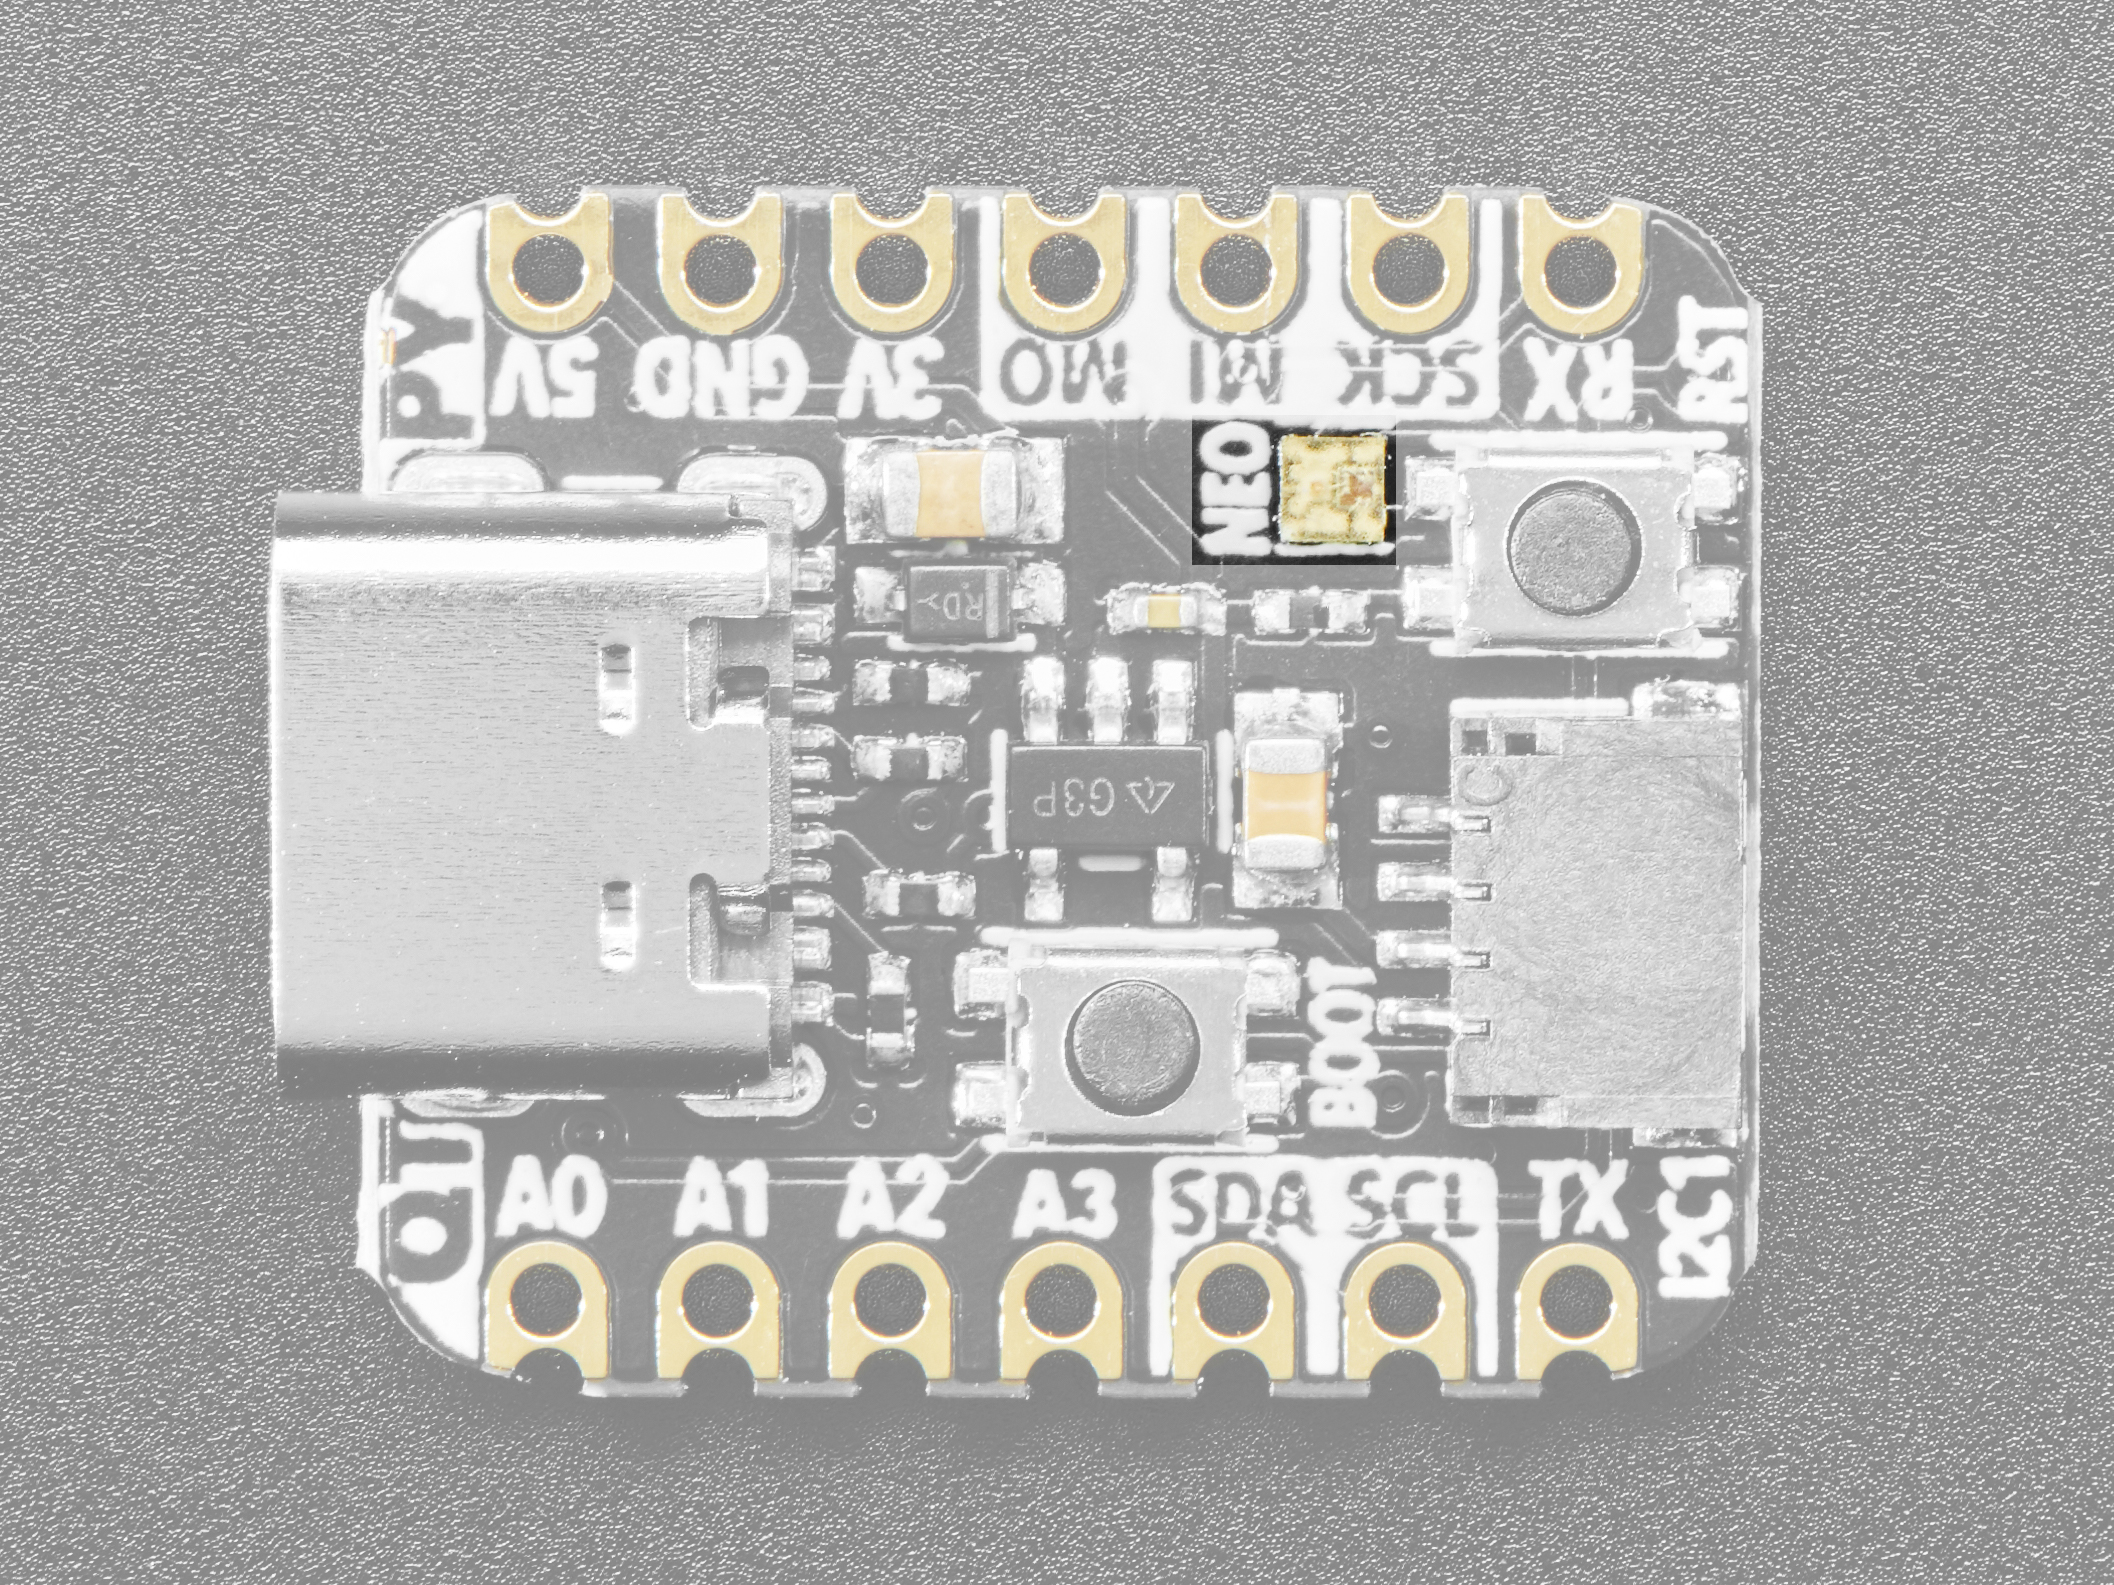 adafruit_products_QTRP_pinouts_NeoPixel.jpg